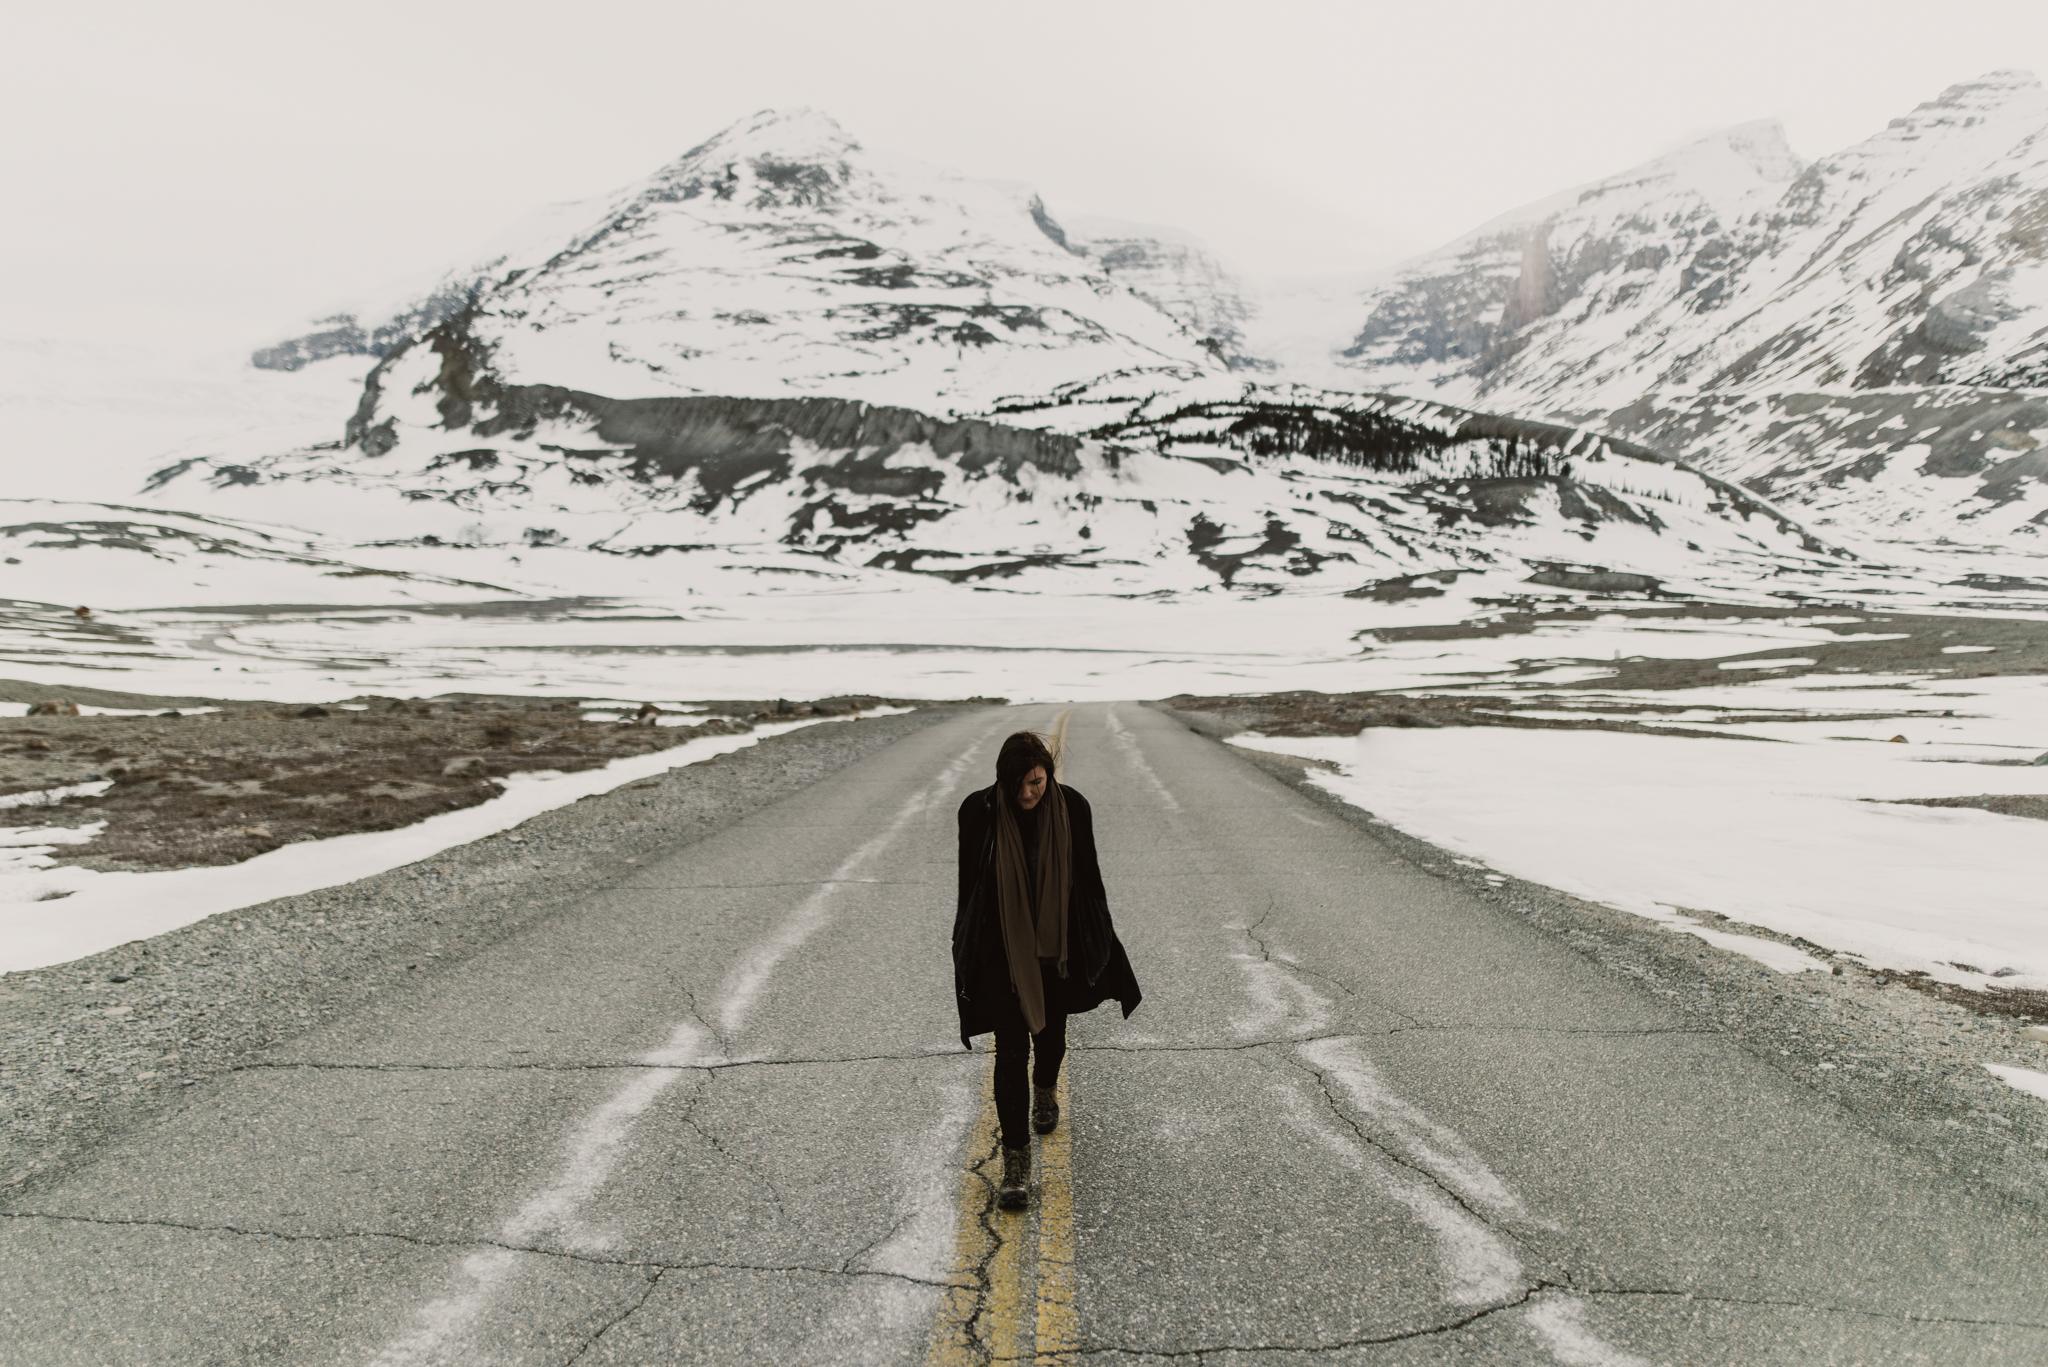 ©The-Ryans-Photo---Athabasca-Glacier,-Ice-Cave-058.jpg